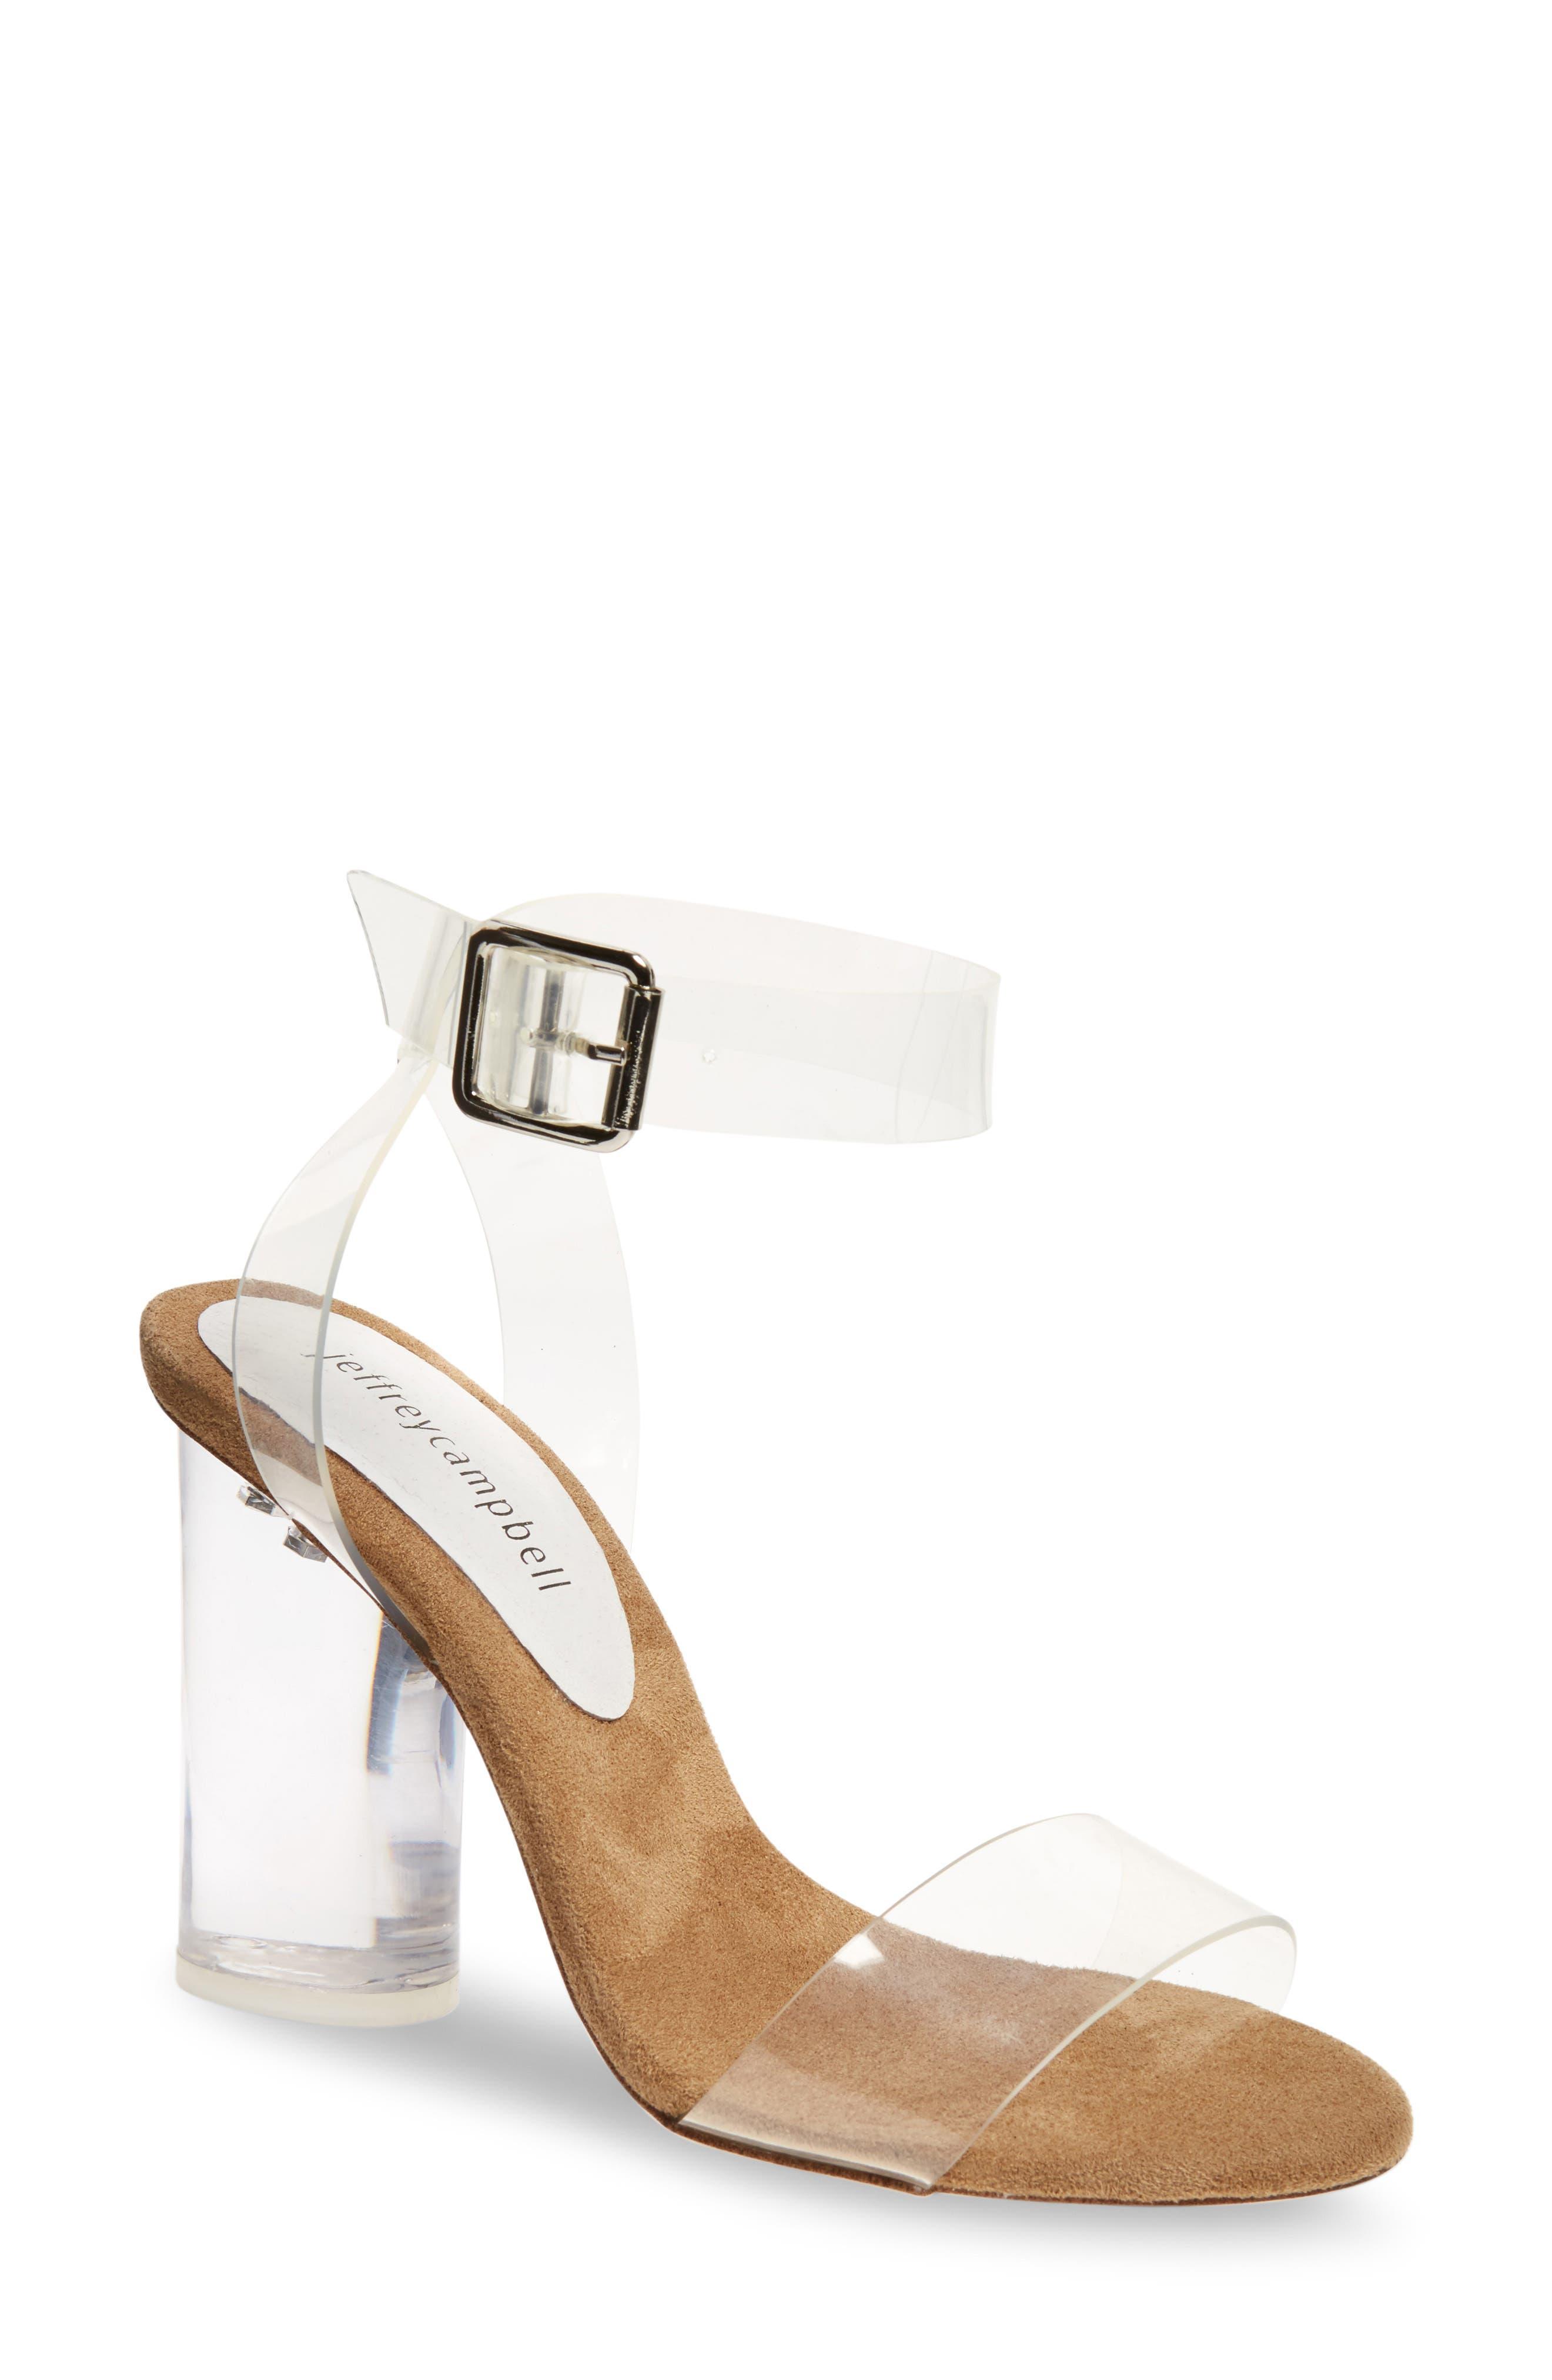 Alternate Image 1 Selected - Jeffrey Campbell Clear Heel Sandal (Women)